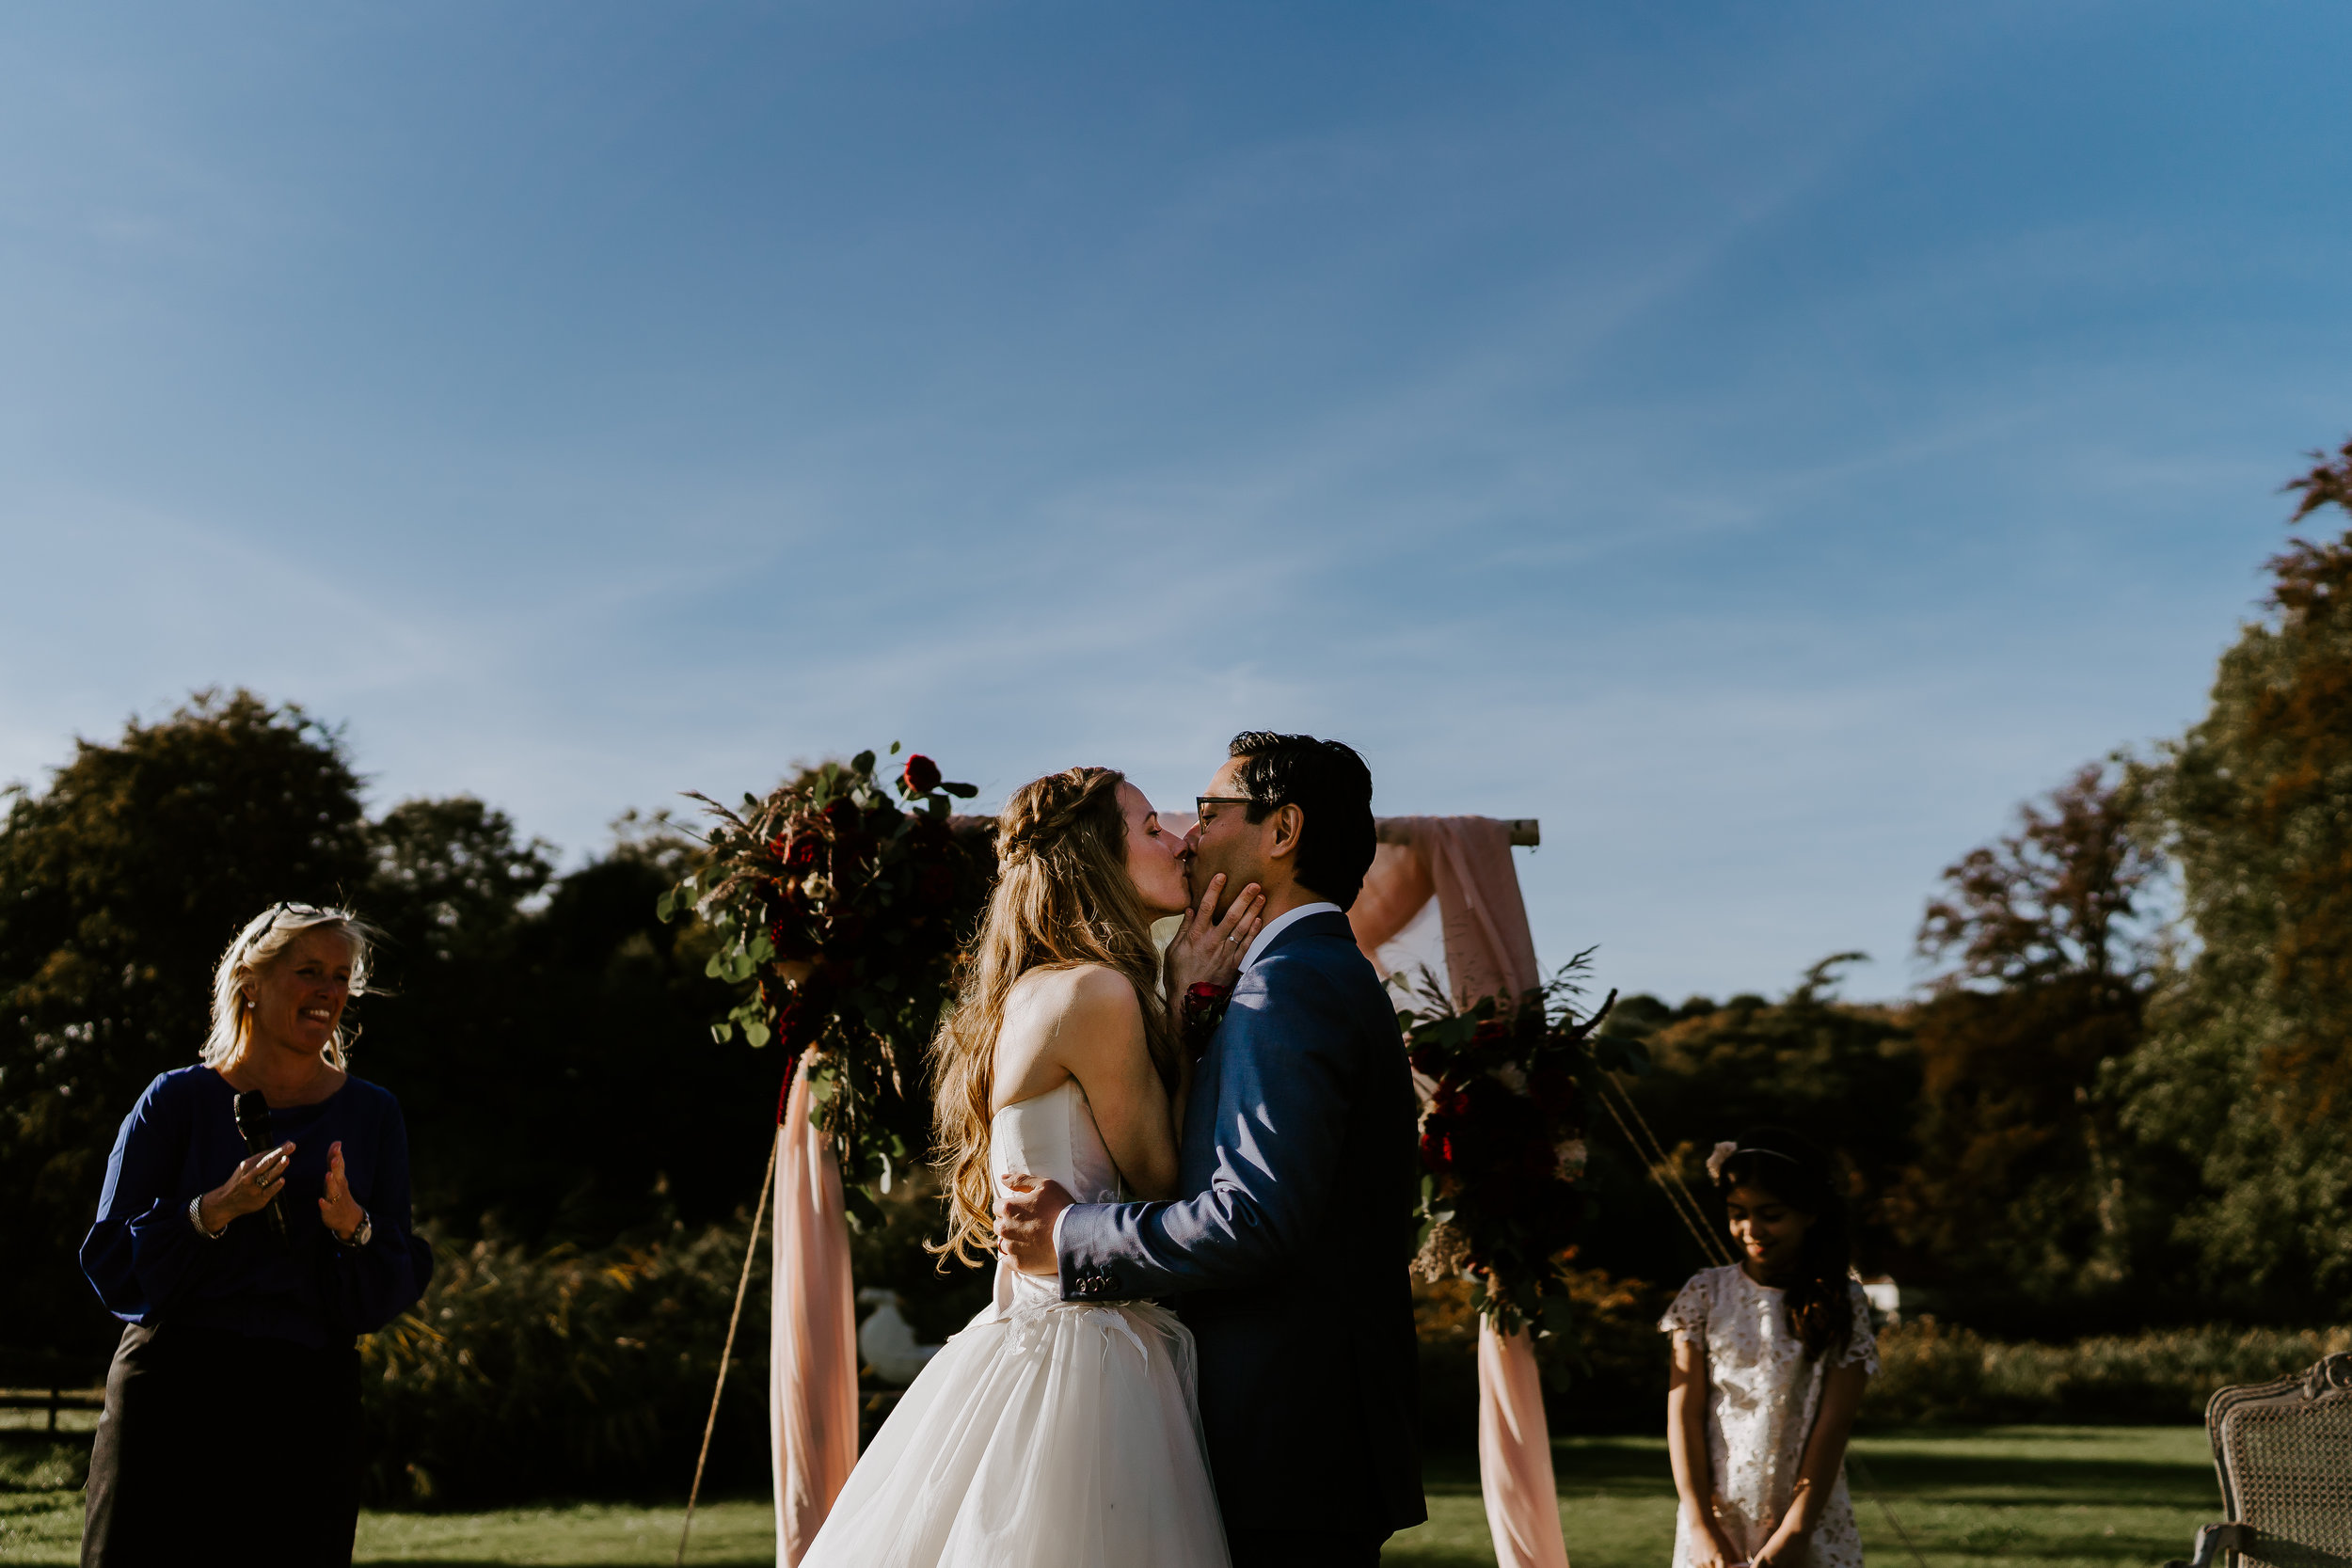 bruiloft-altembrouck-overthemoonweddings41.jpg